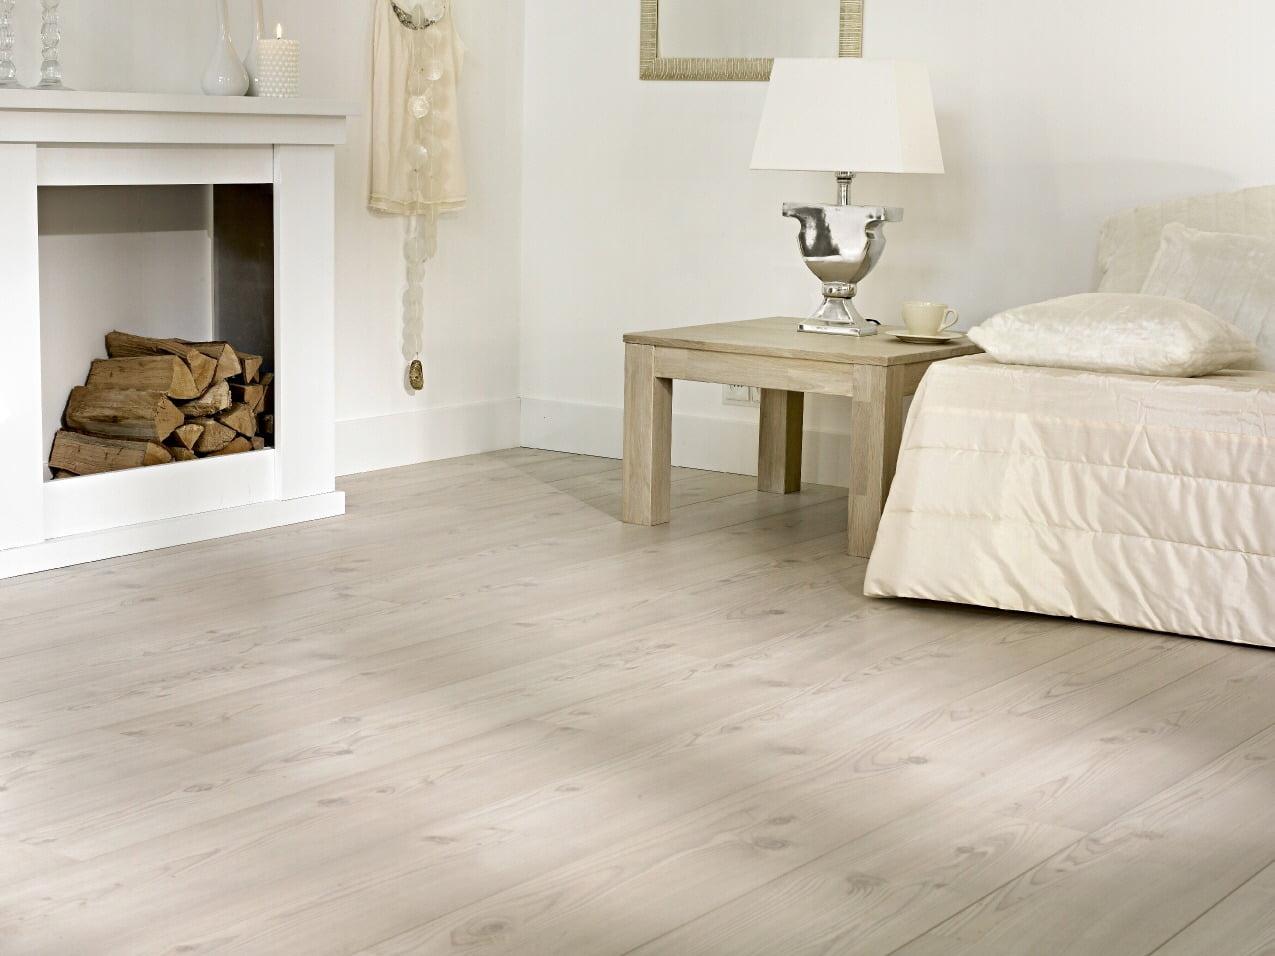 Laminaat Leggen Slaapkamer : Ondervloer laminaat leggen welke kant boven decoratie interieur